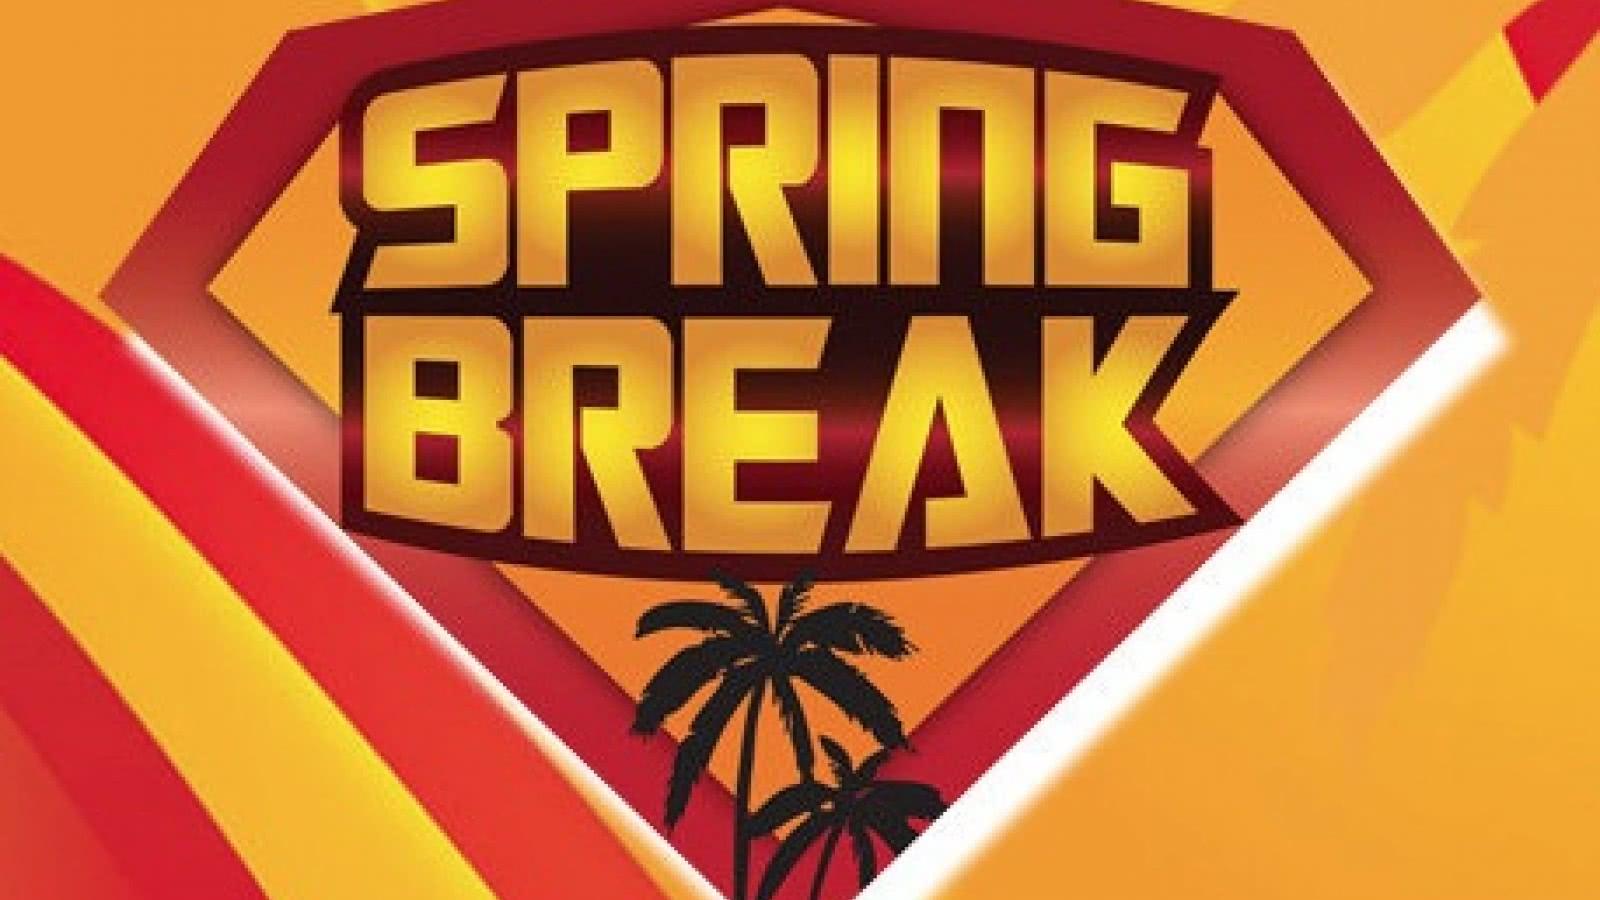 Le Spring break - underground